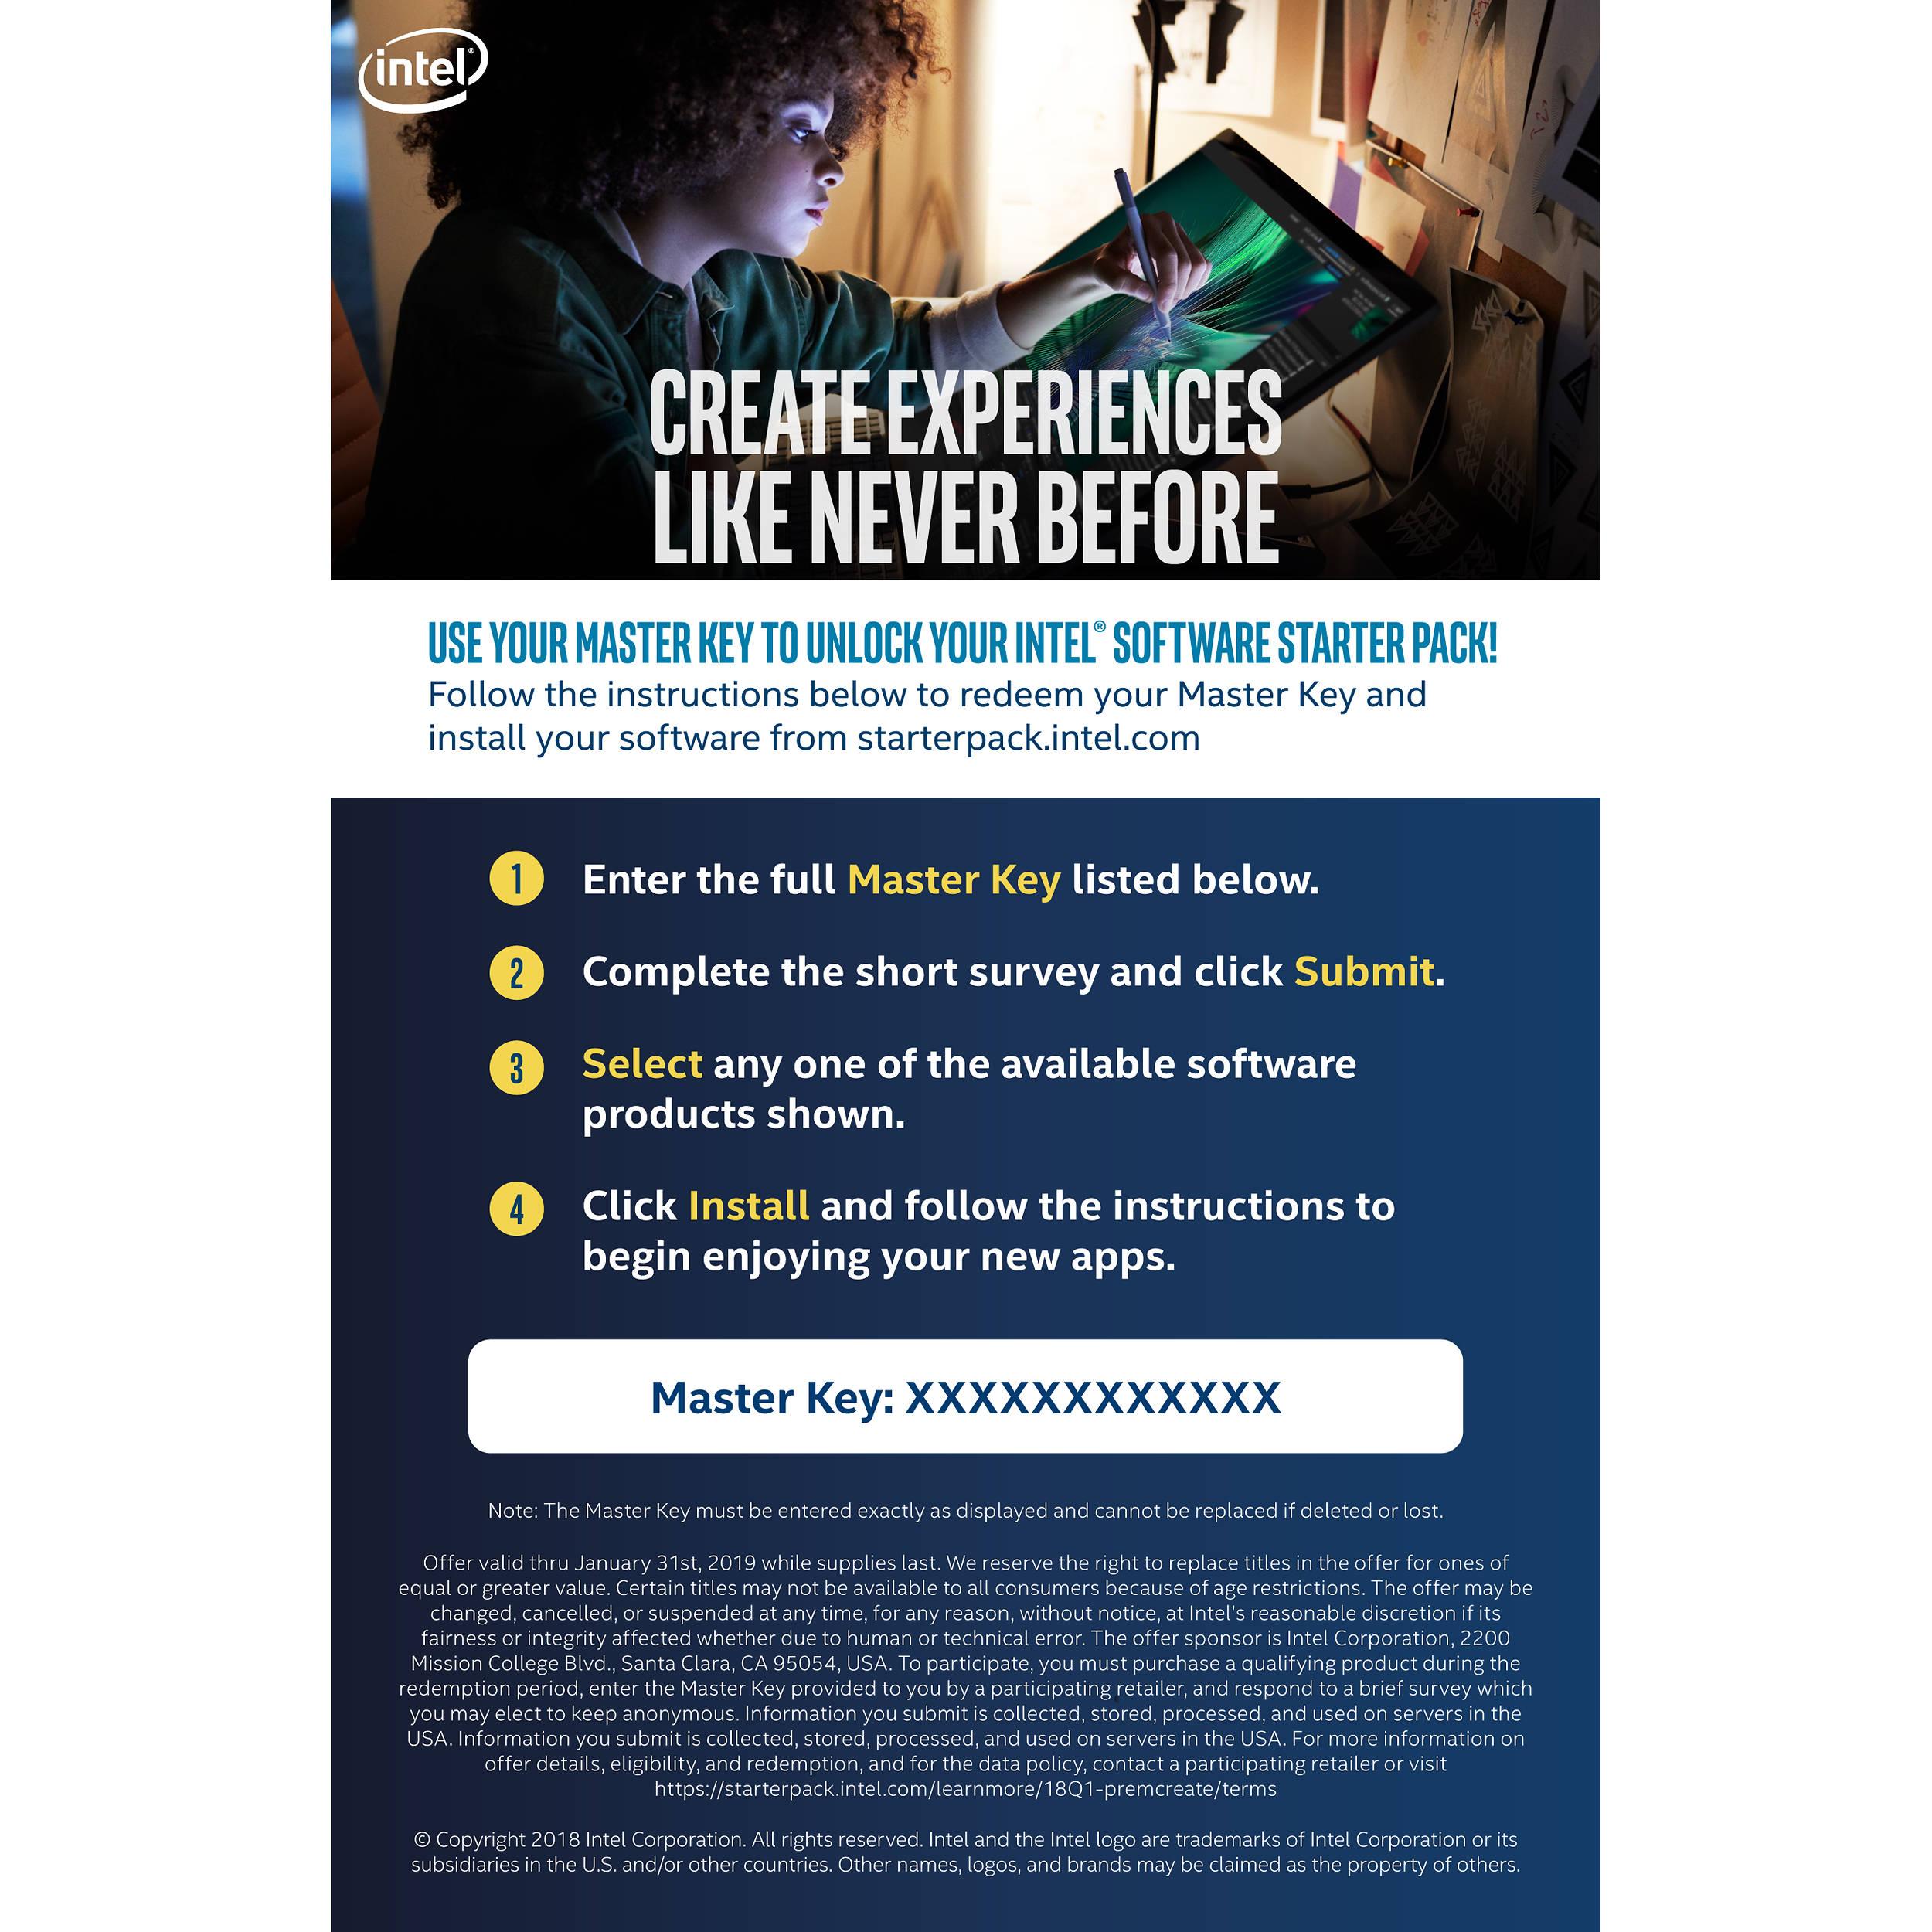 Intel Premium Creativity Bundle